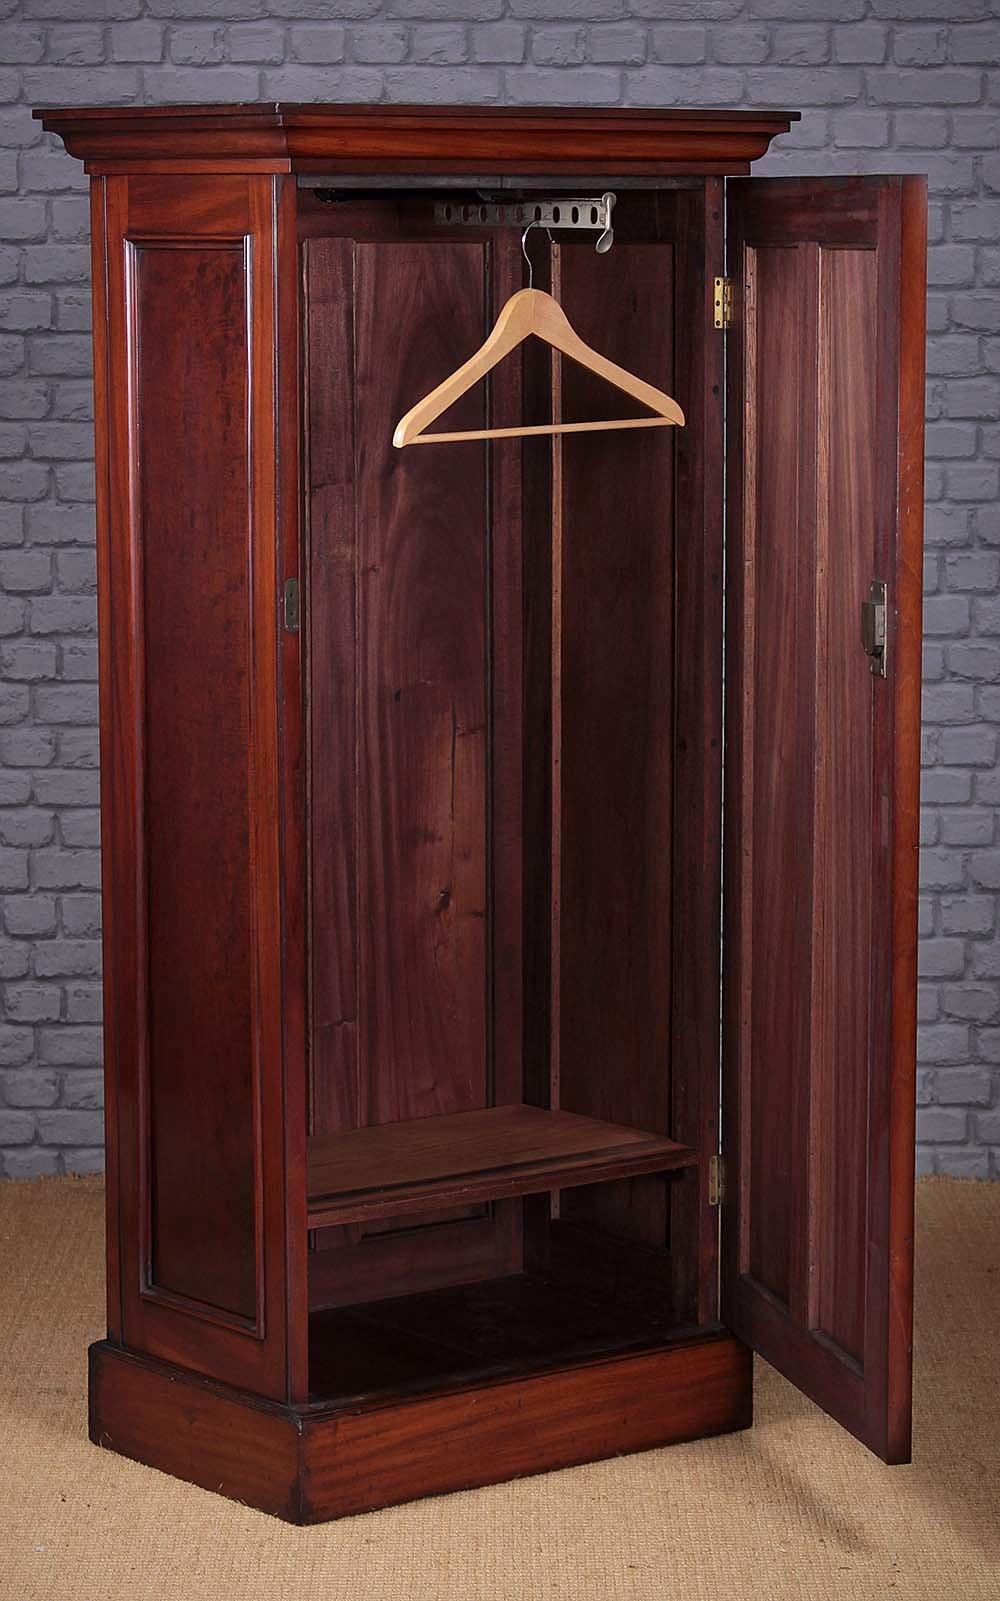 Mahogany Cloak Cupboard Or Child S Wardrobe Antiques Atlas